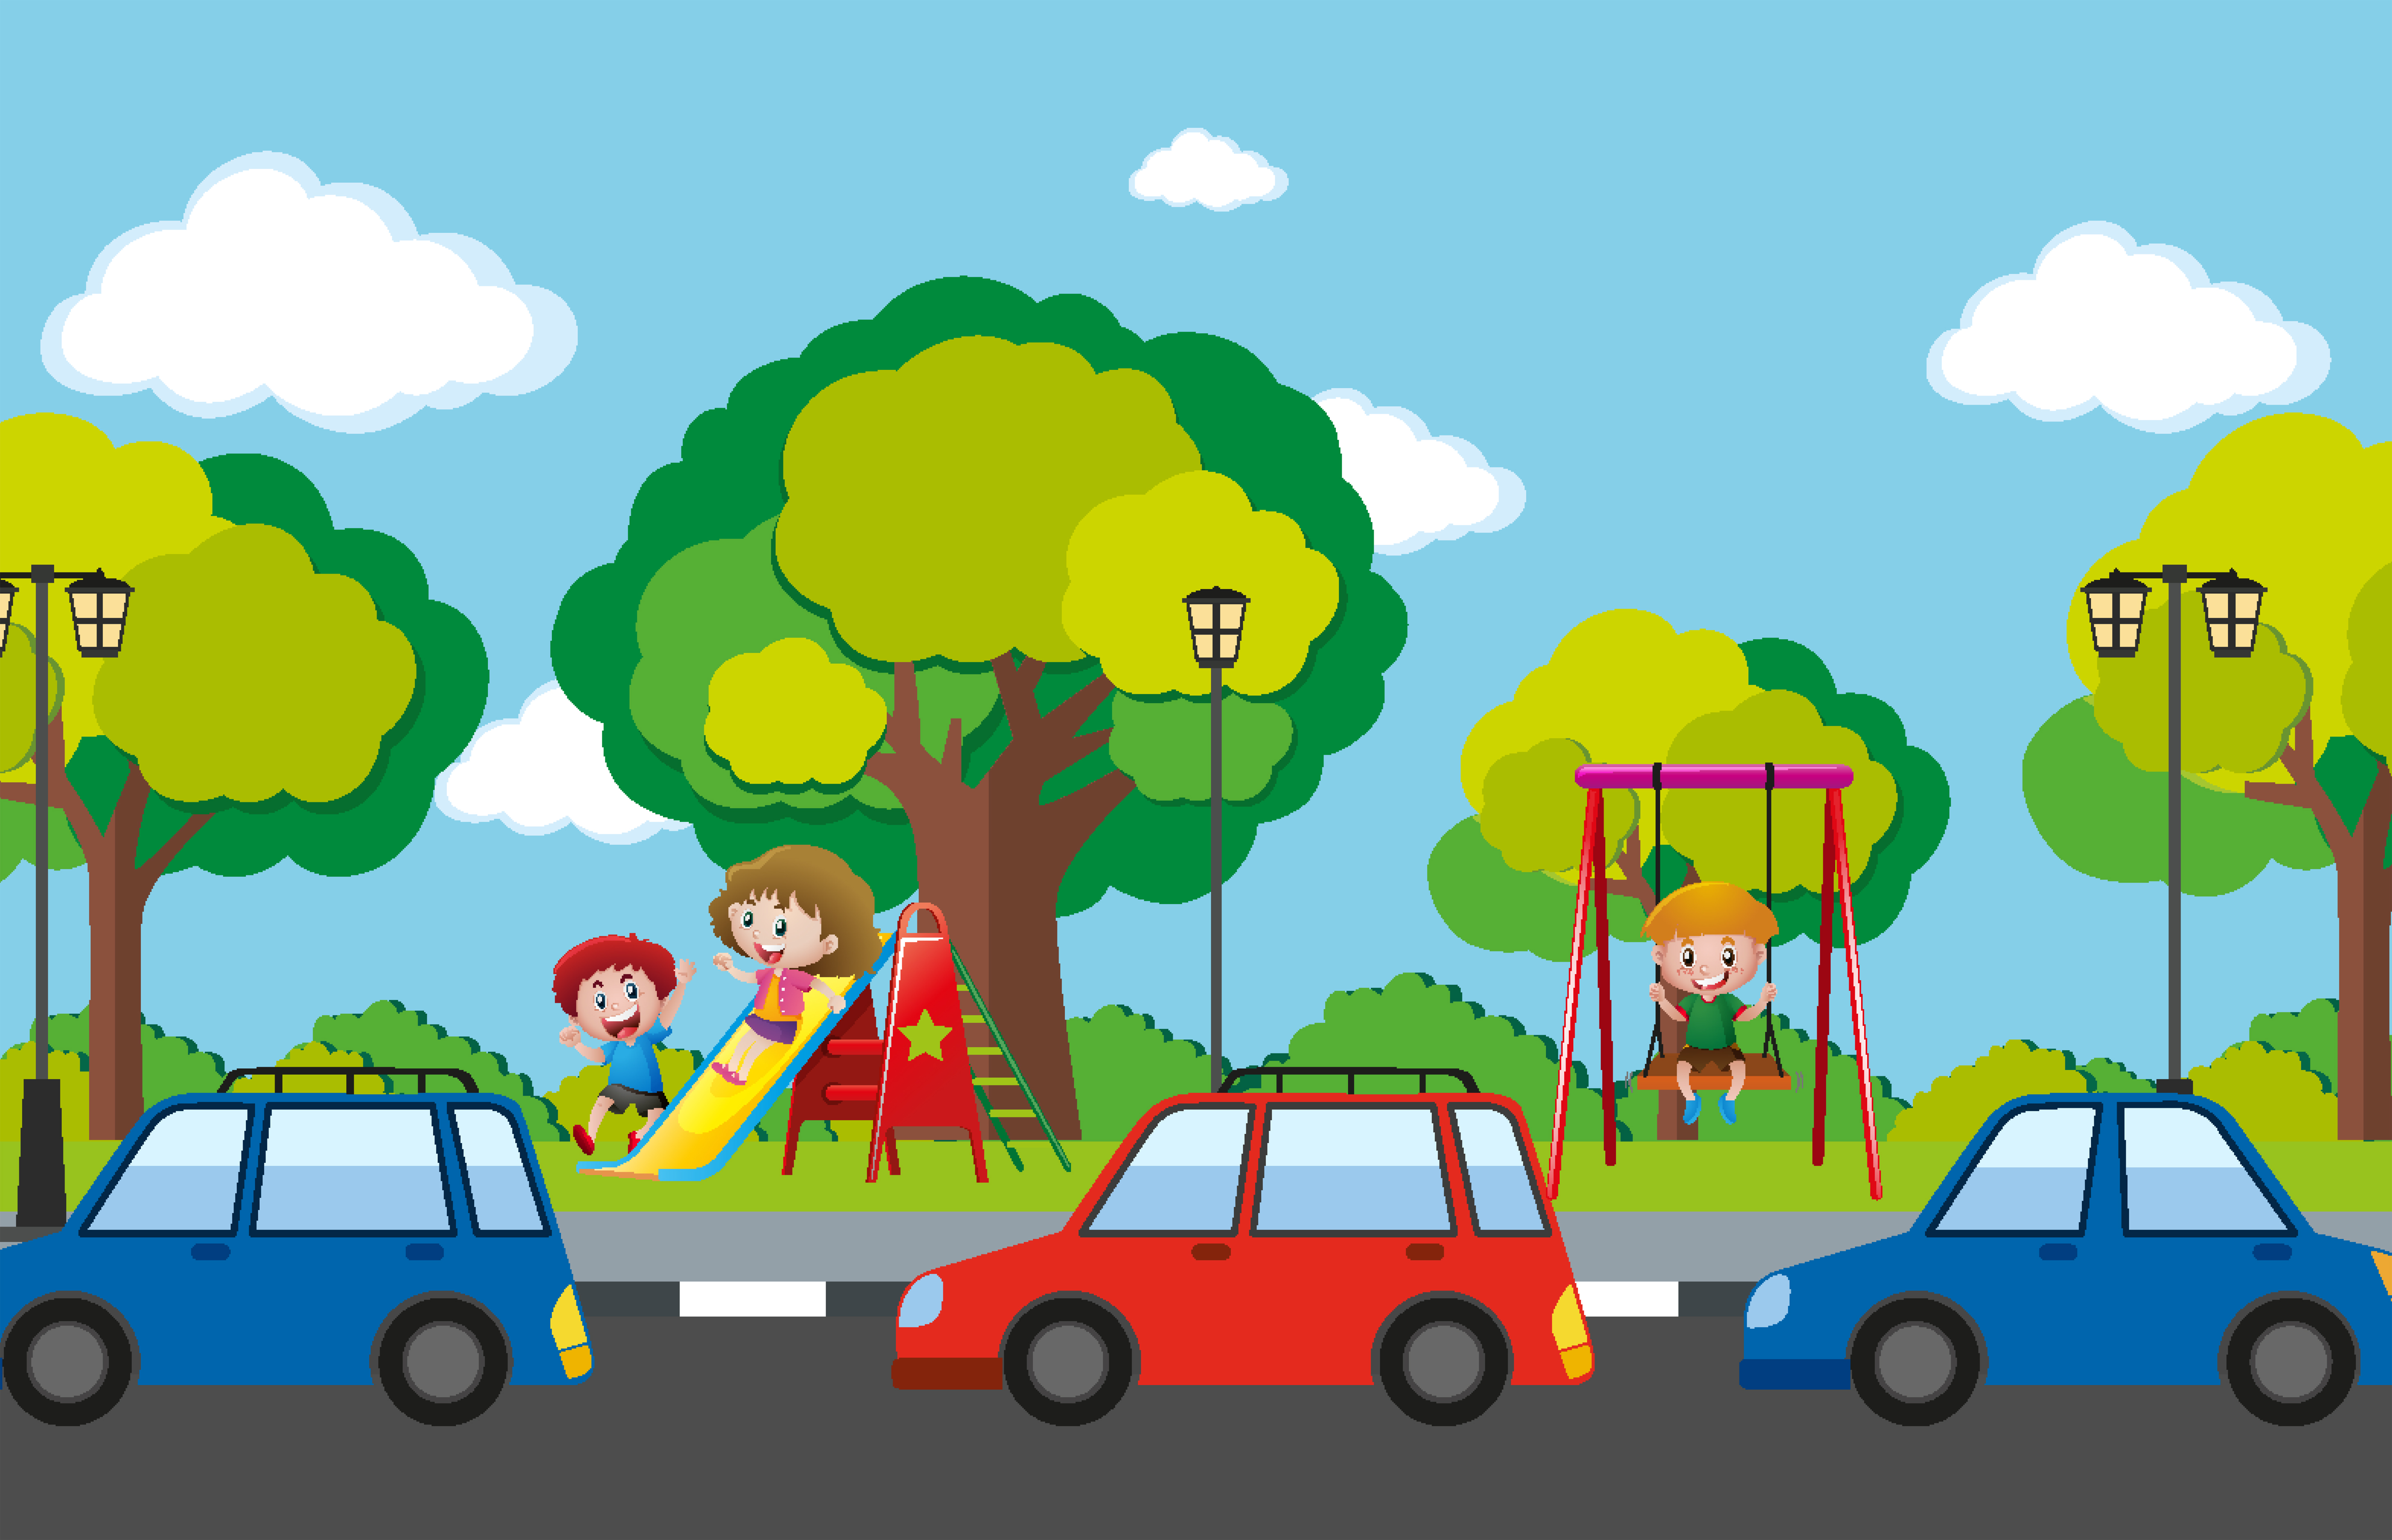 Playground Illustration Flat